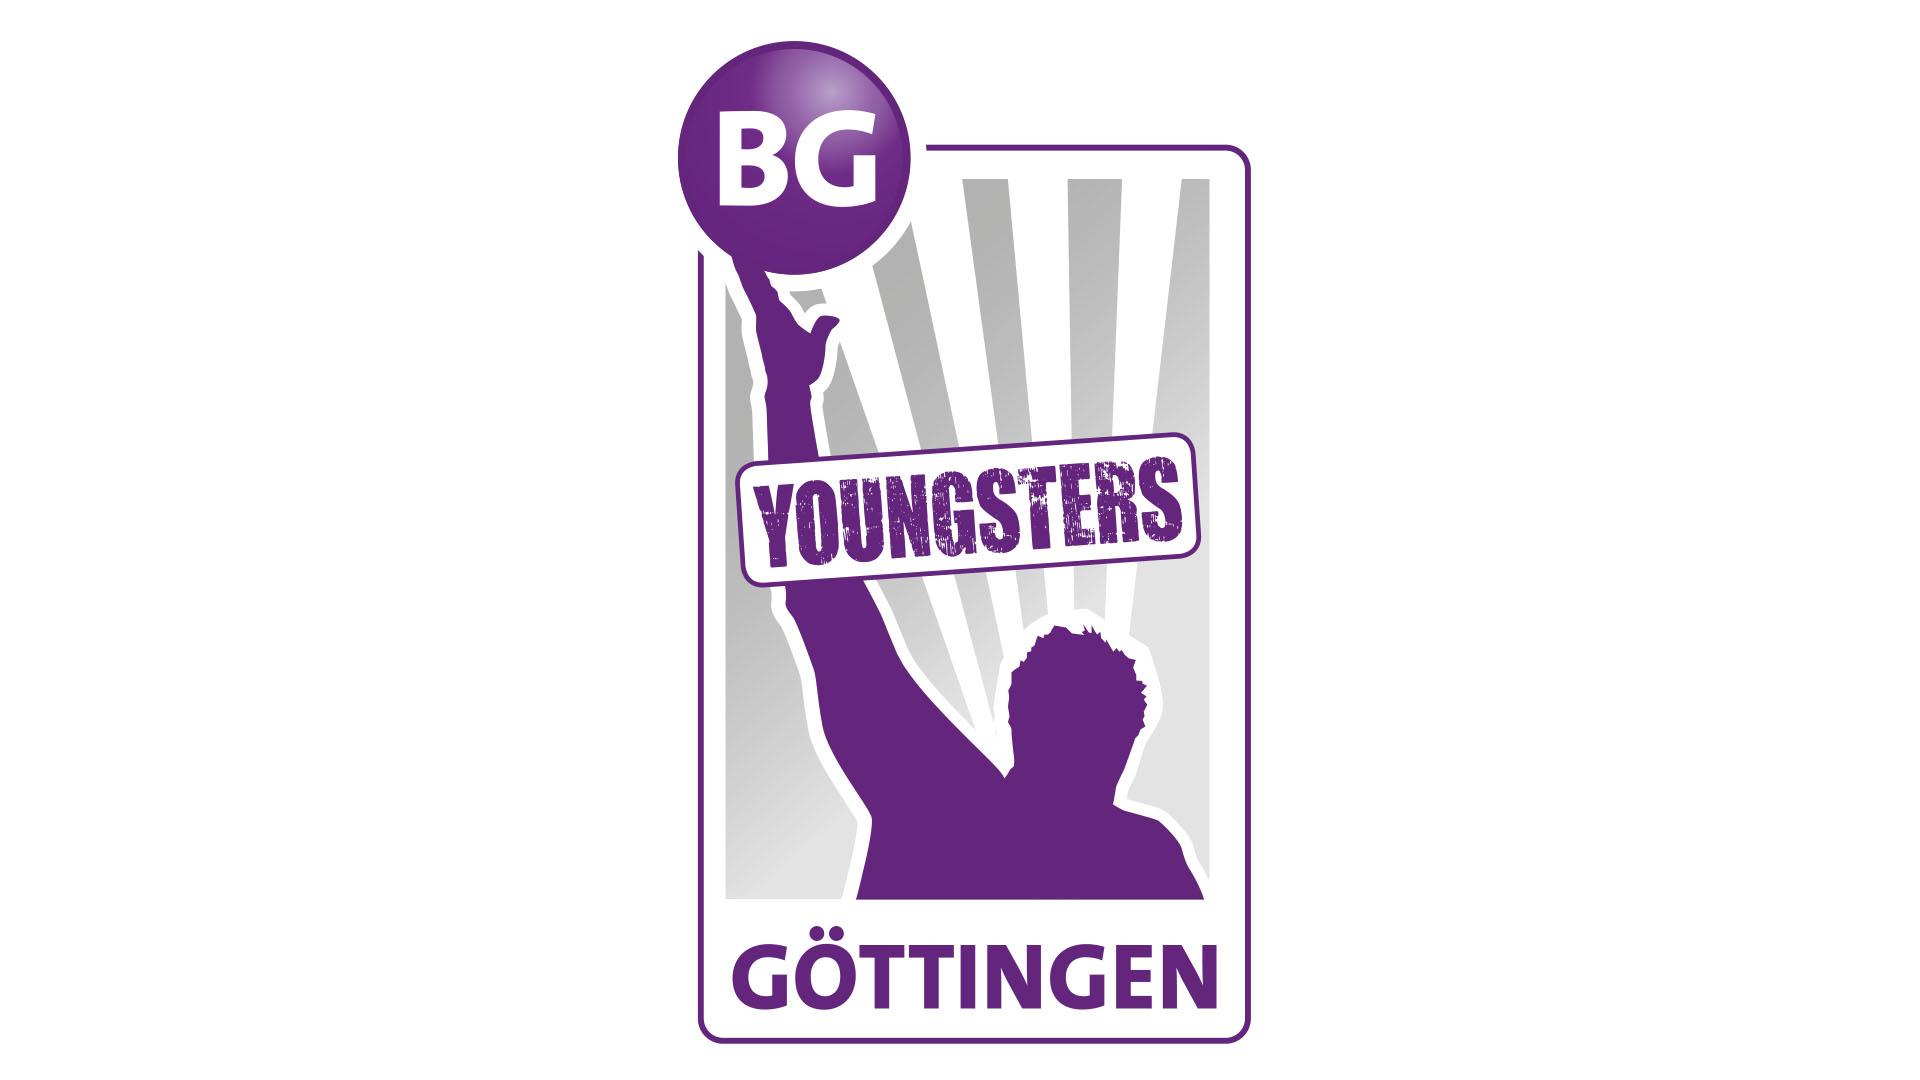 BG-Göttingen_YOUNGSTERS_2017_4C